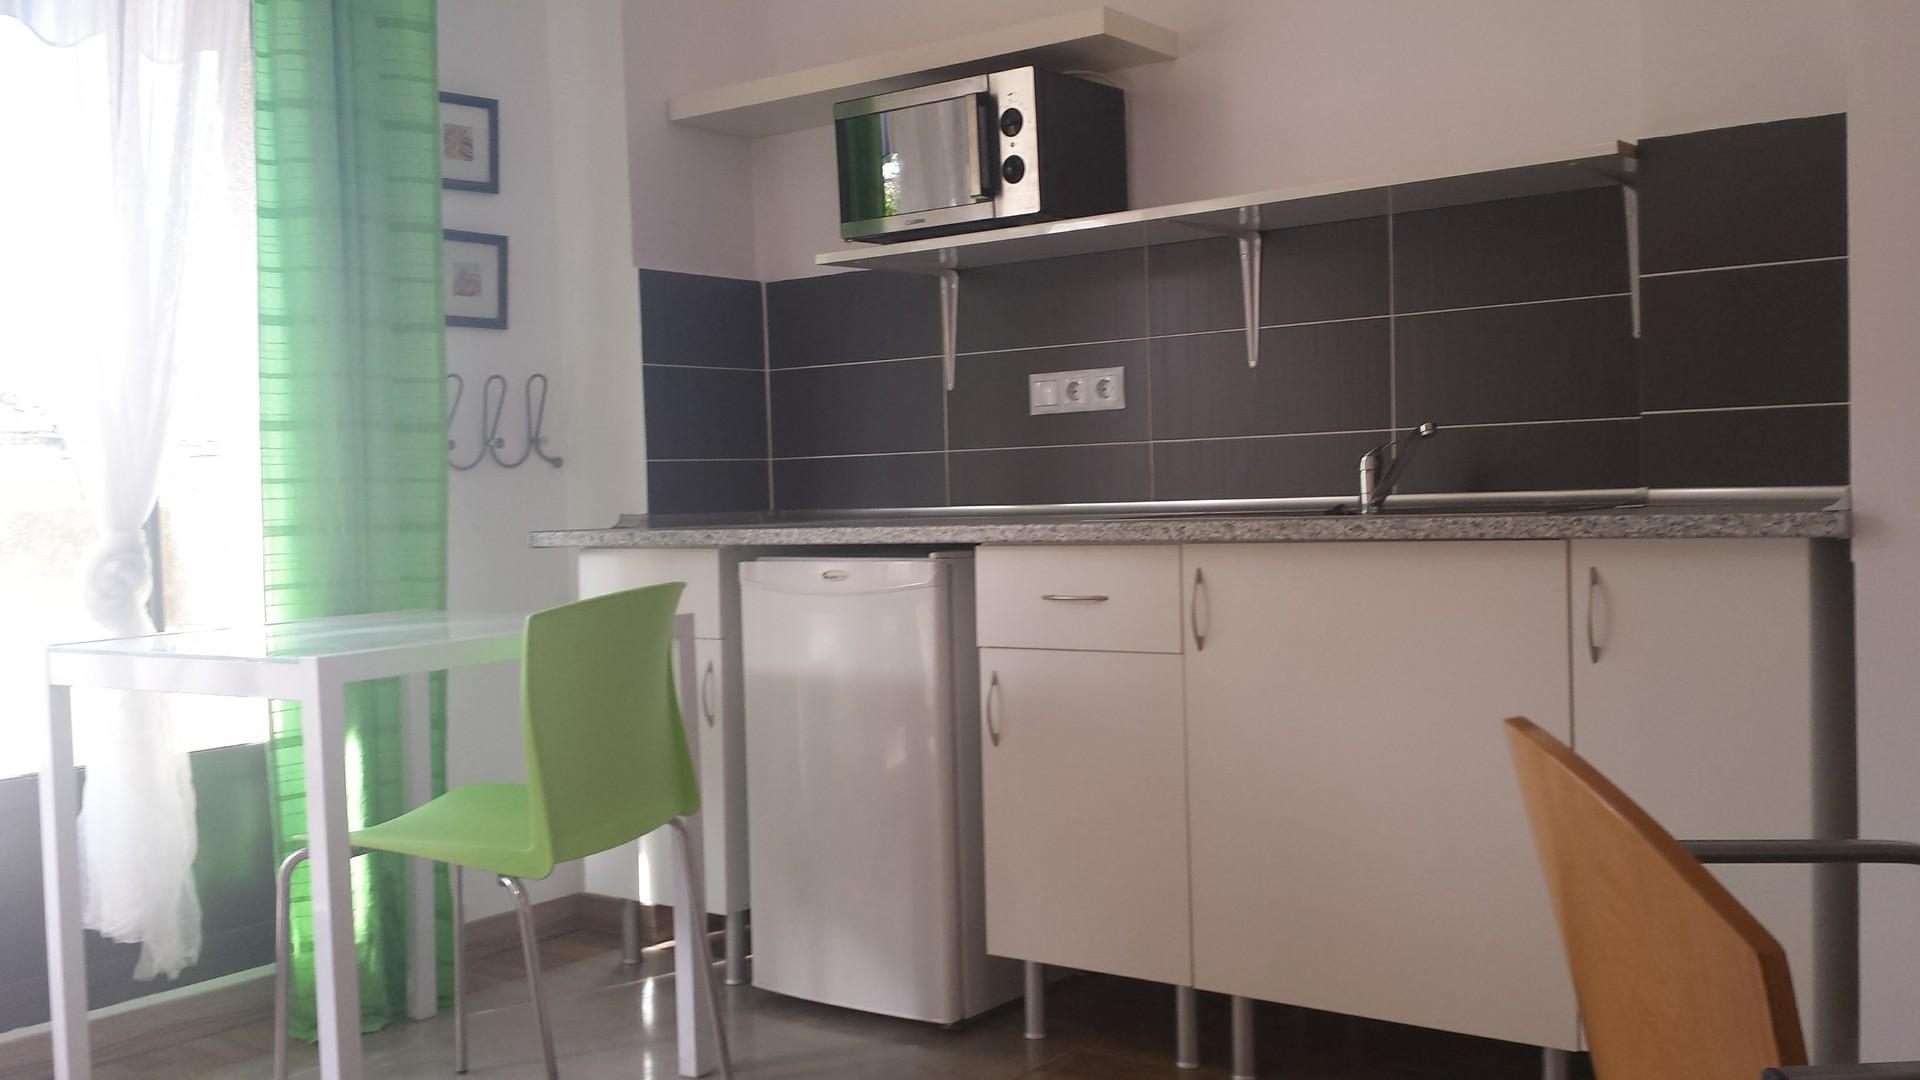 Mini StudioApartment Private Kitchen Bathroom and